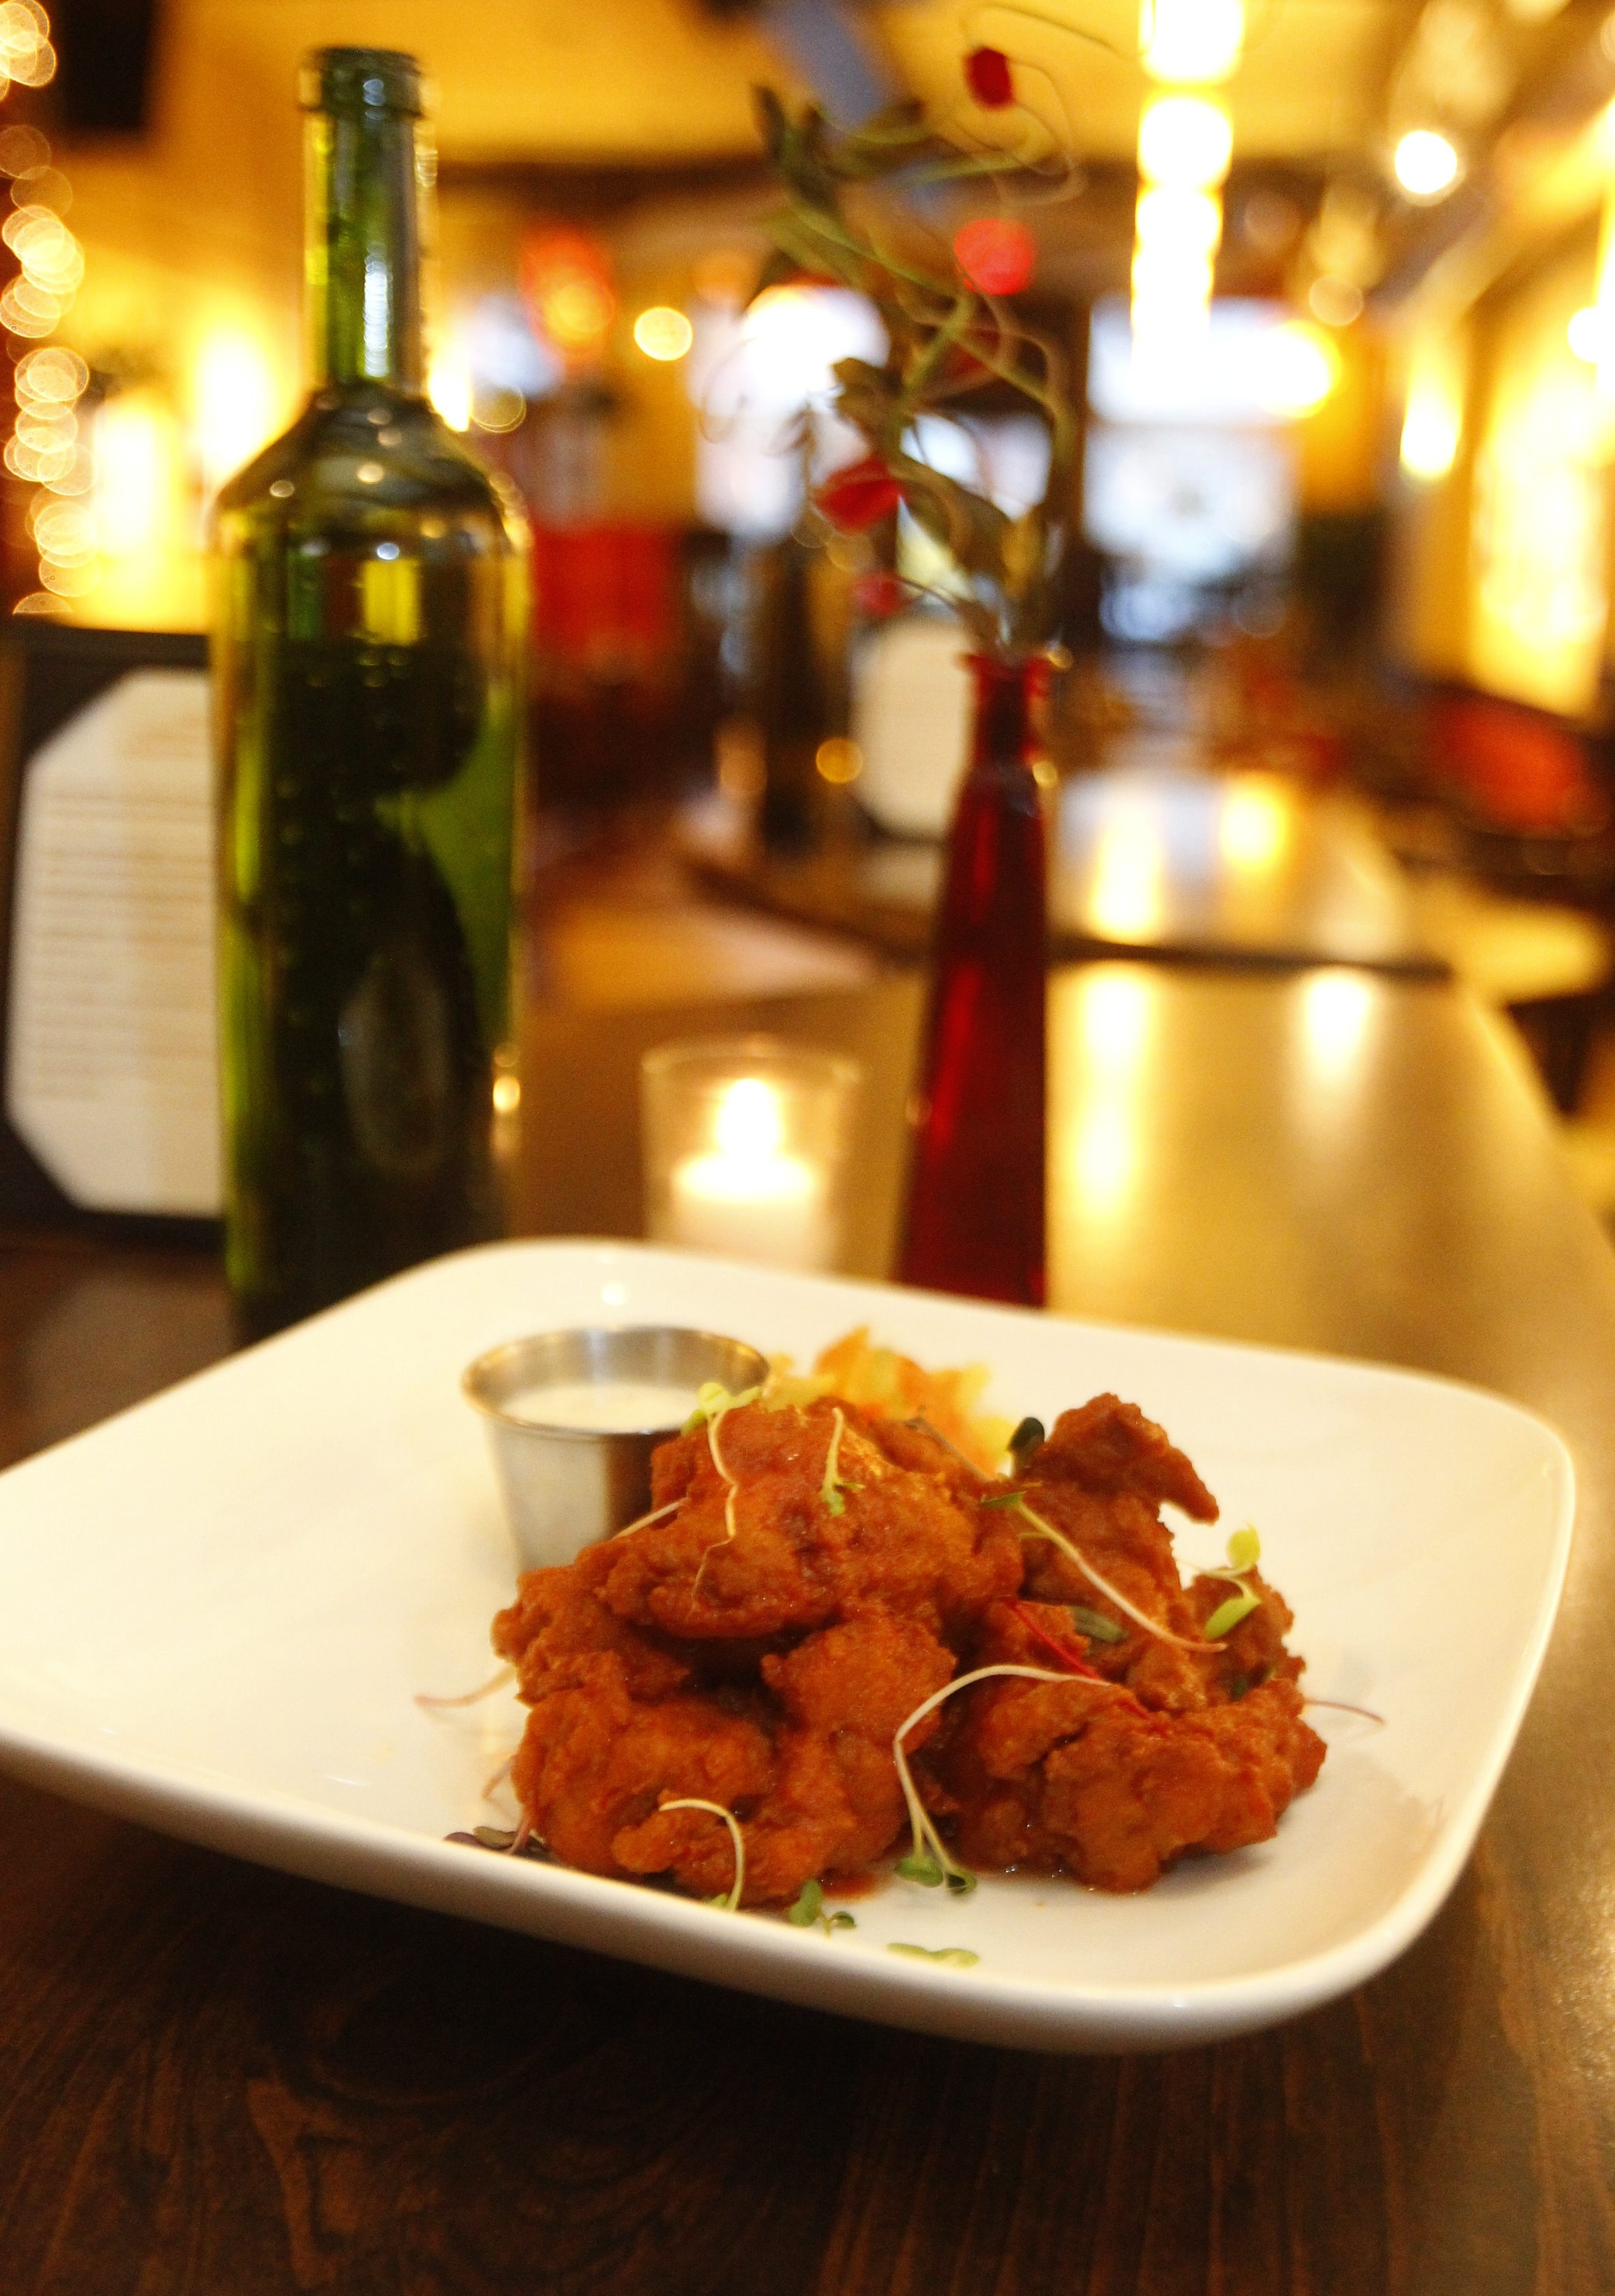 Merge's adventurous fare includes Seitan wings, a vegan dish.